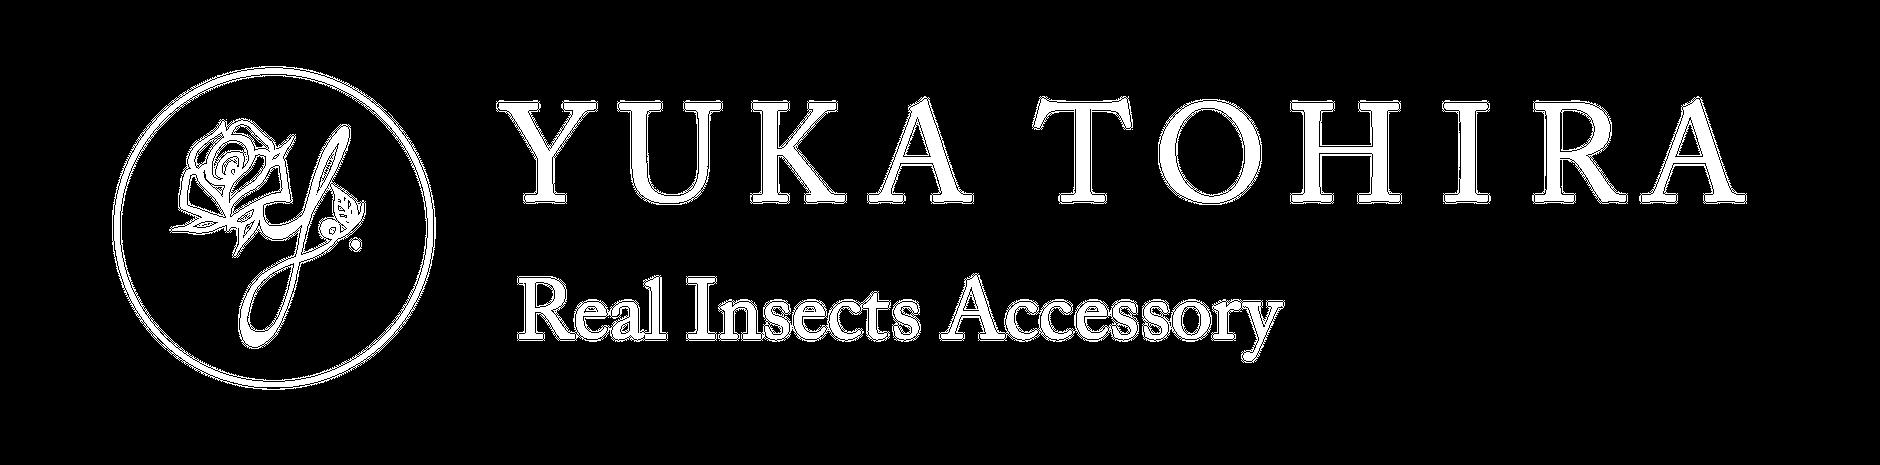 YUKA TOHIRA Accessory